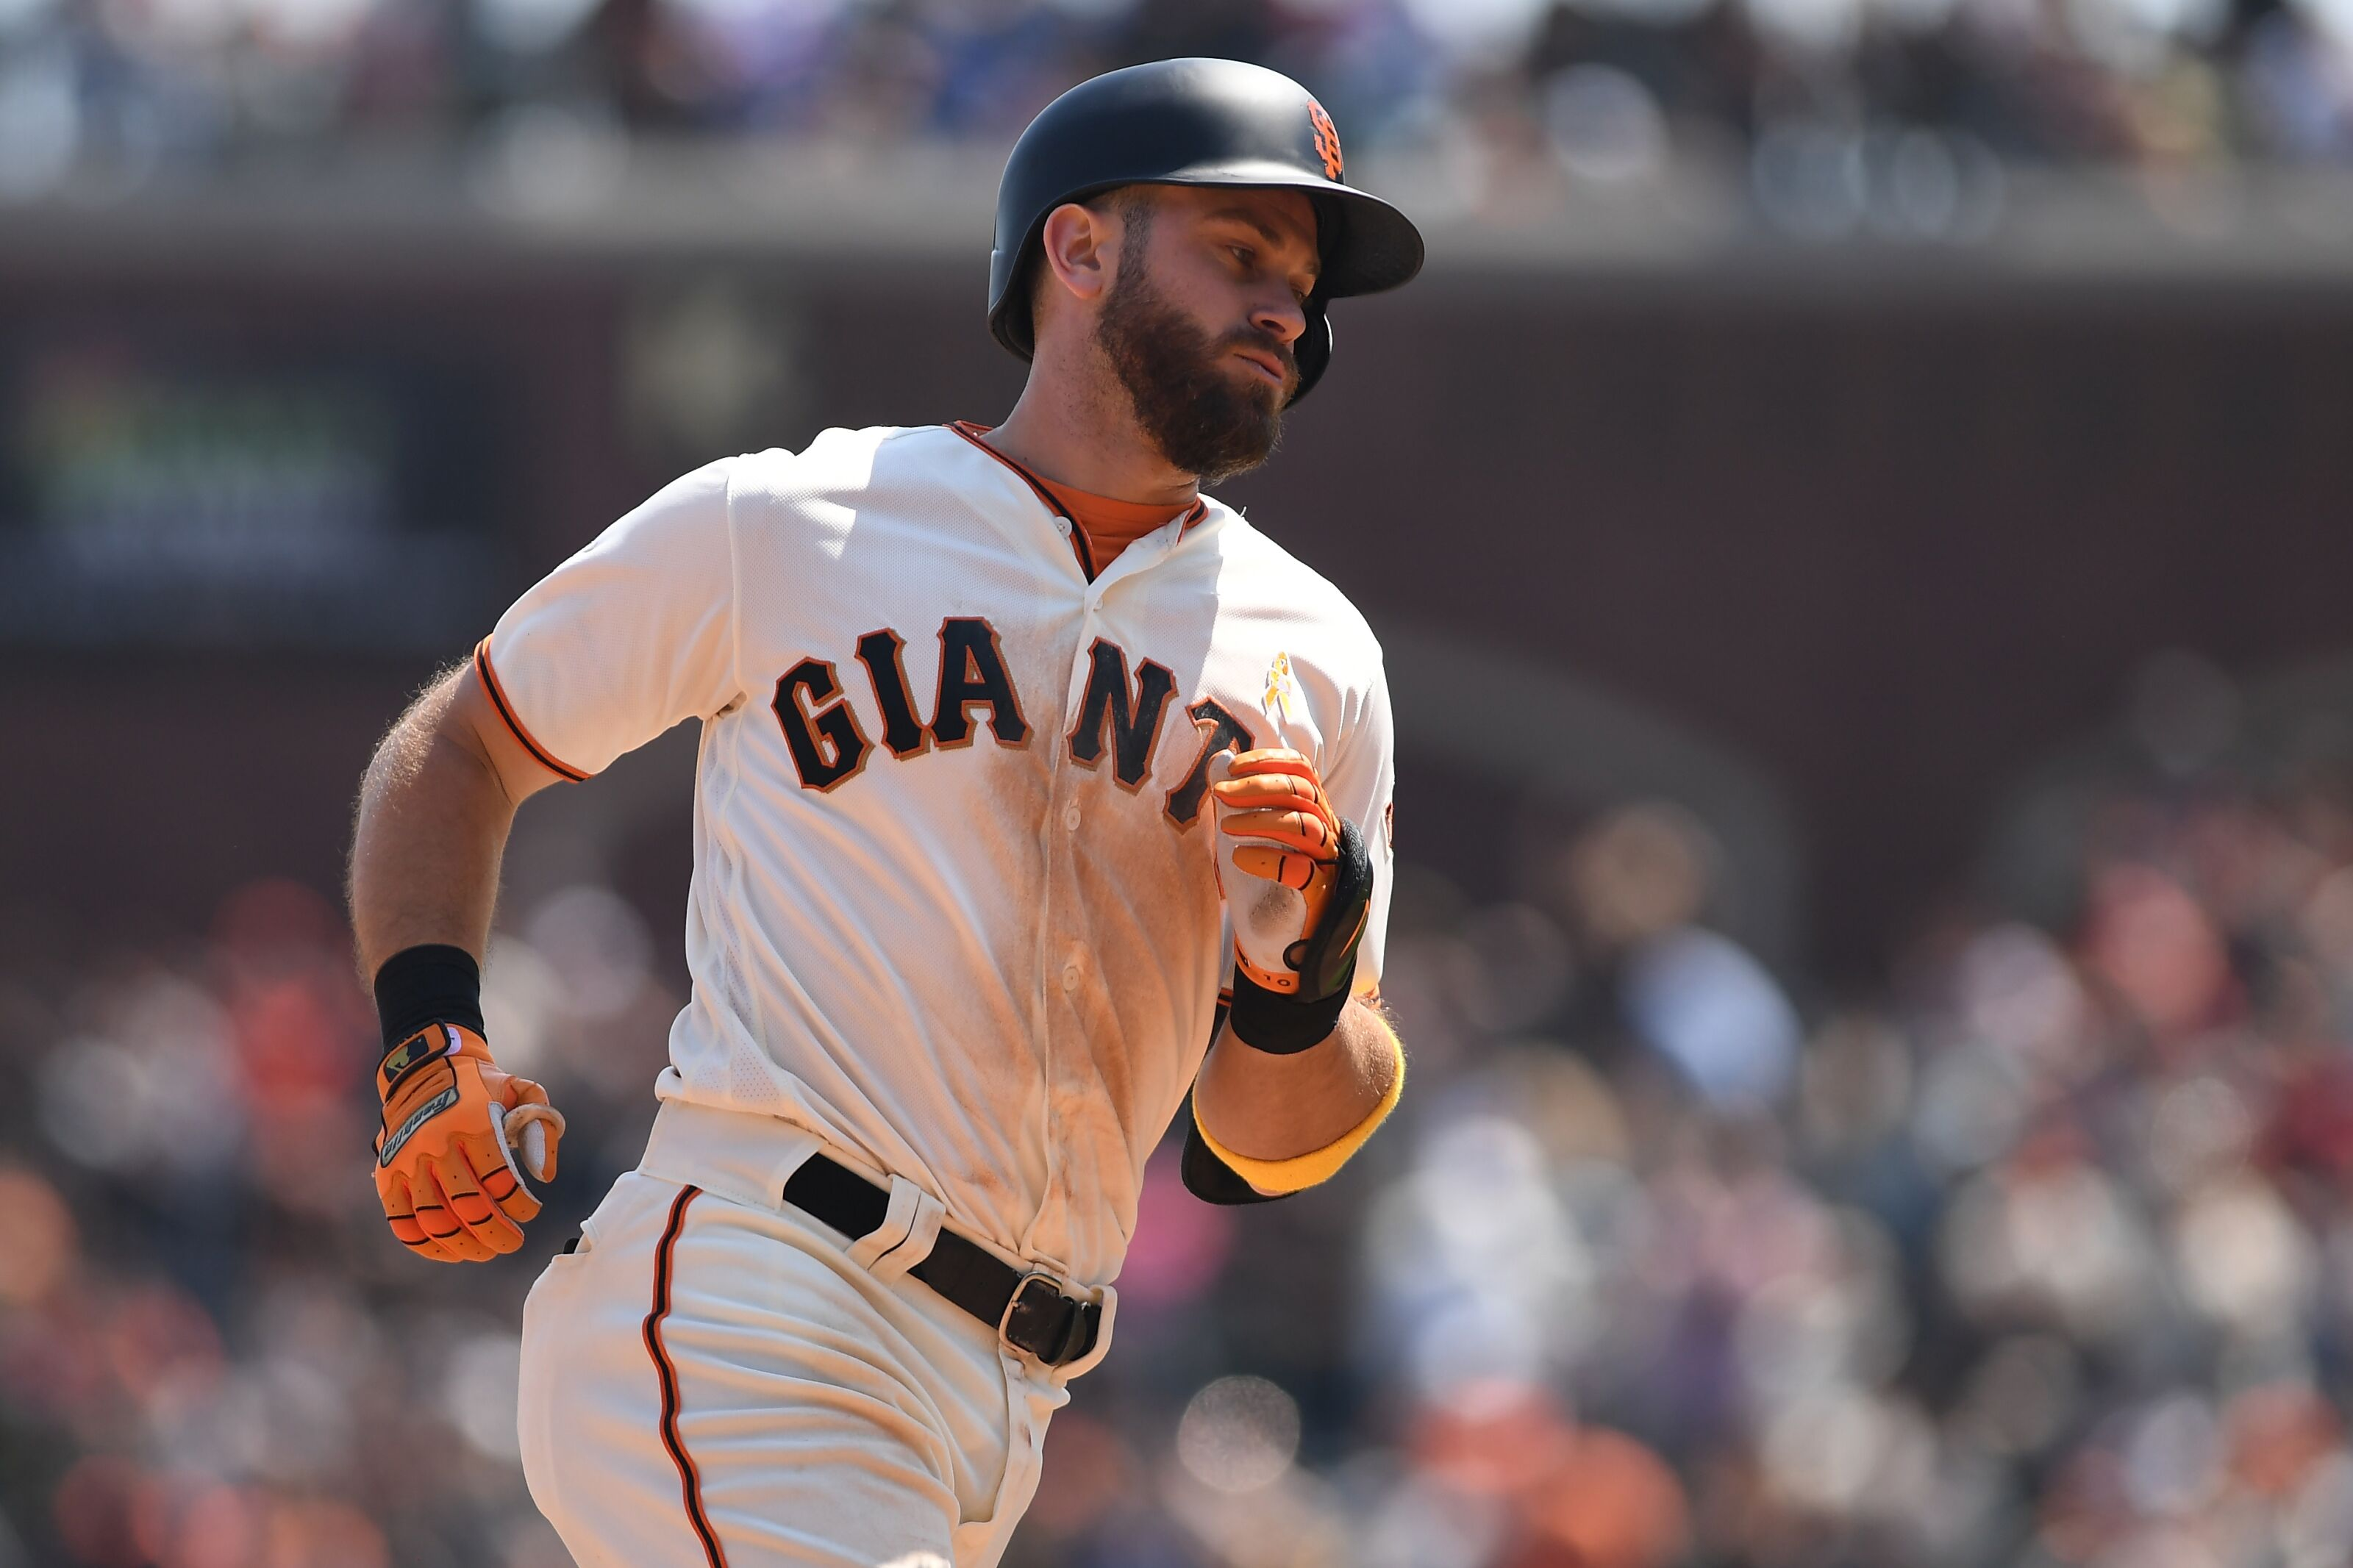 San Francisco Giants Rumors: Team gauging interest in Evan Longoria trade